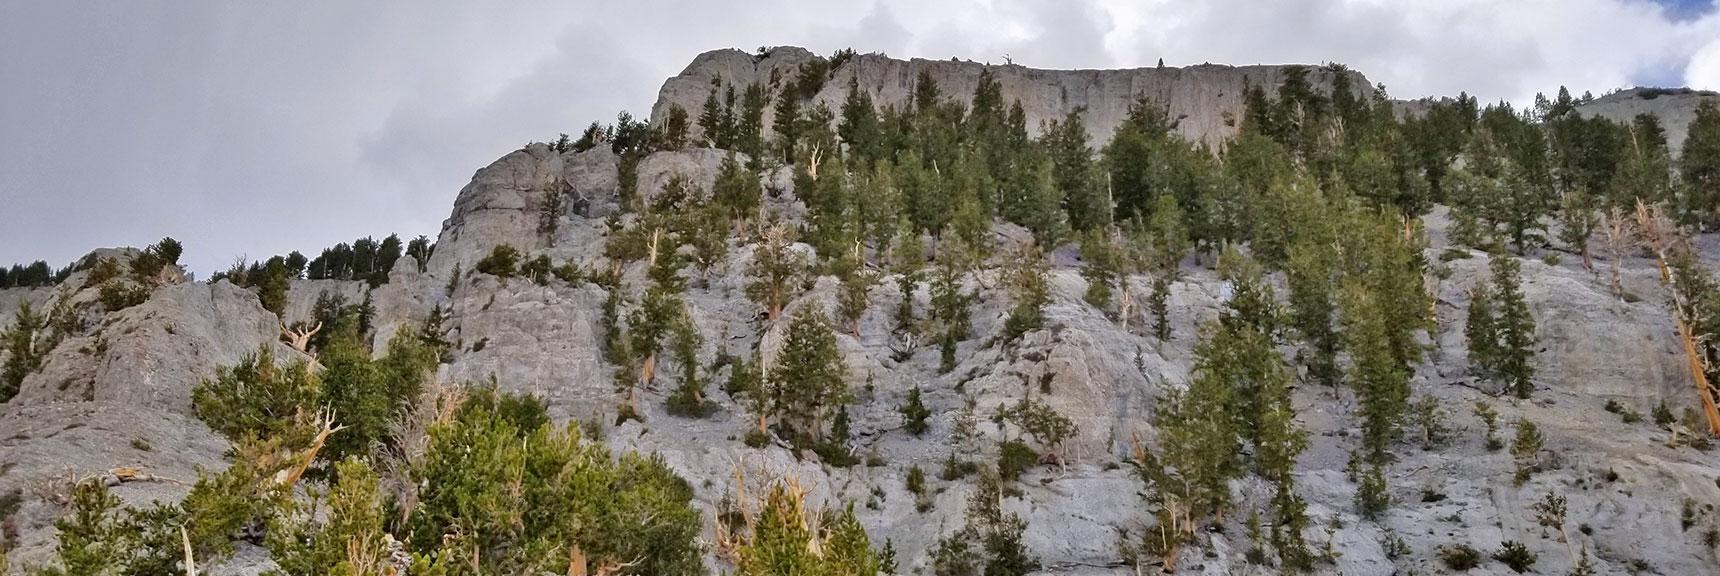 Mummy Mountain Eastern Cliff and Ridge   Mummy Mountain NNE, Mt. Charleston Wilderness, Nevada, Slide 024